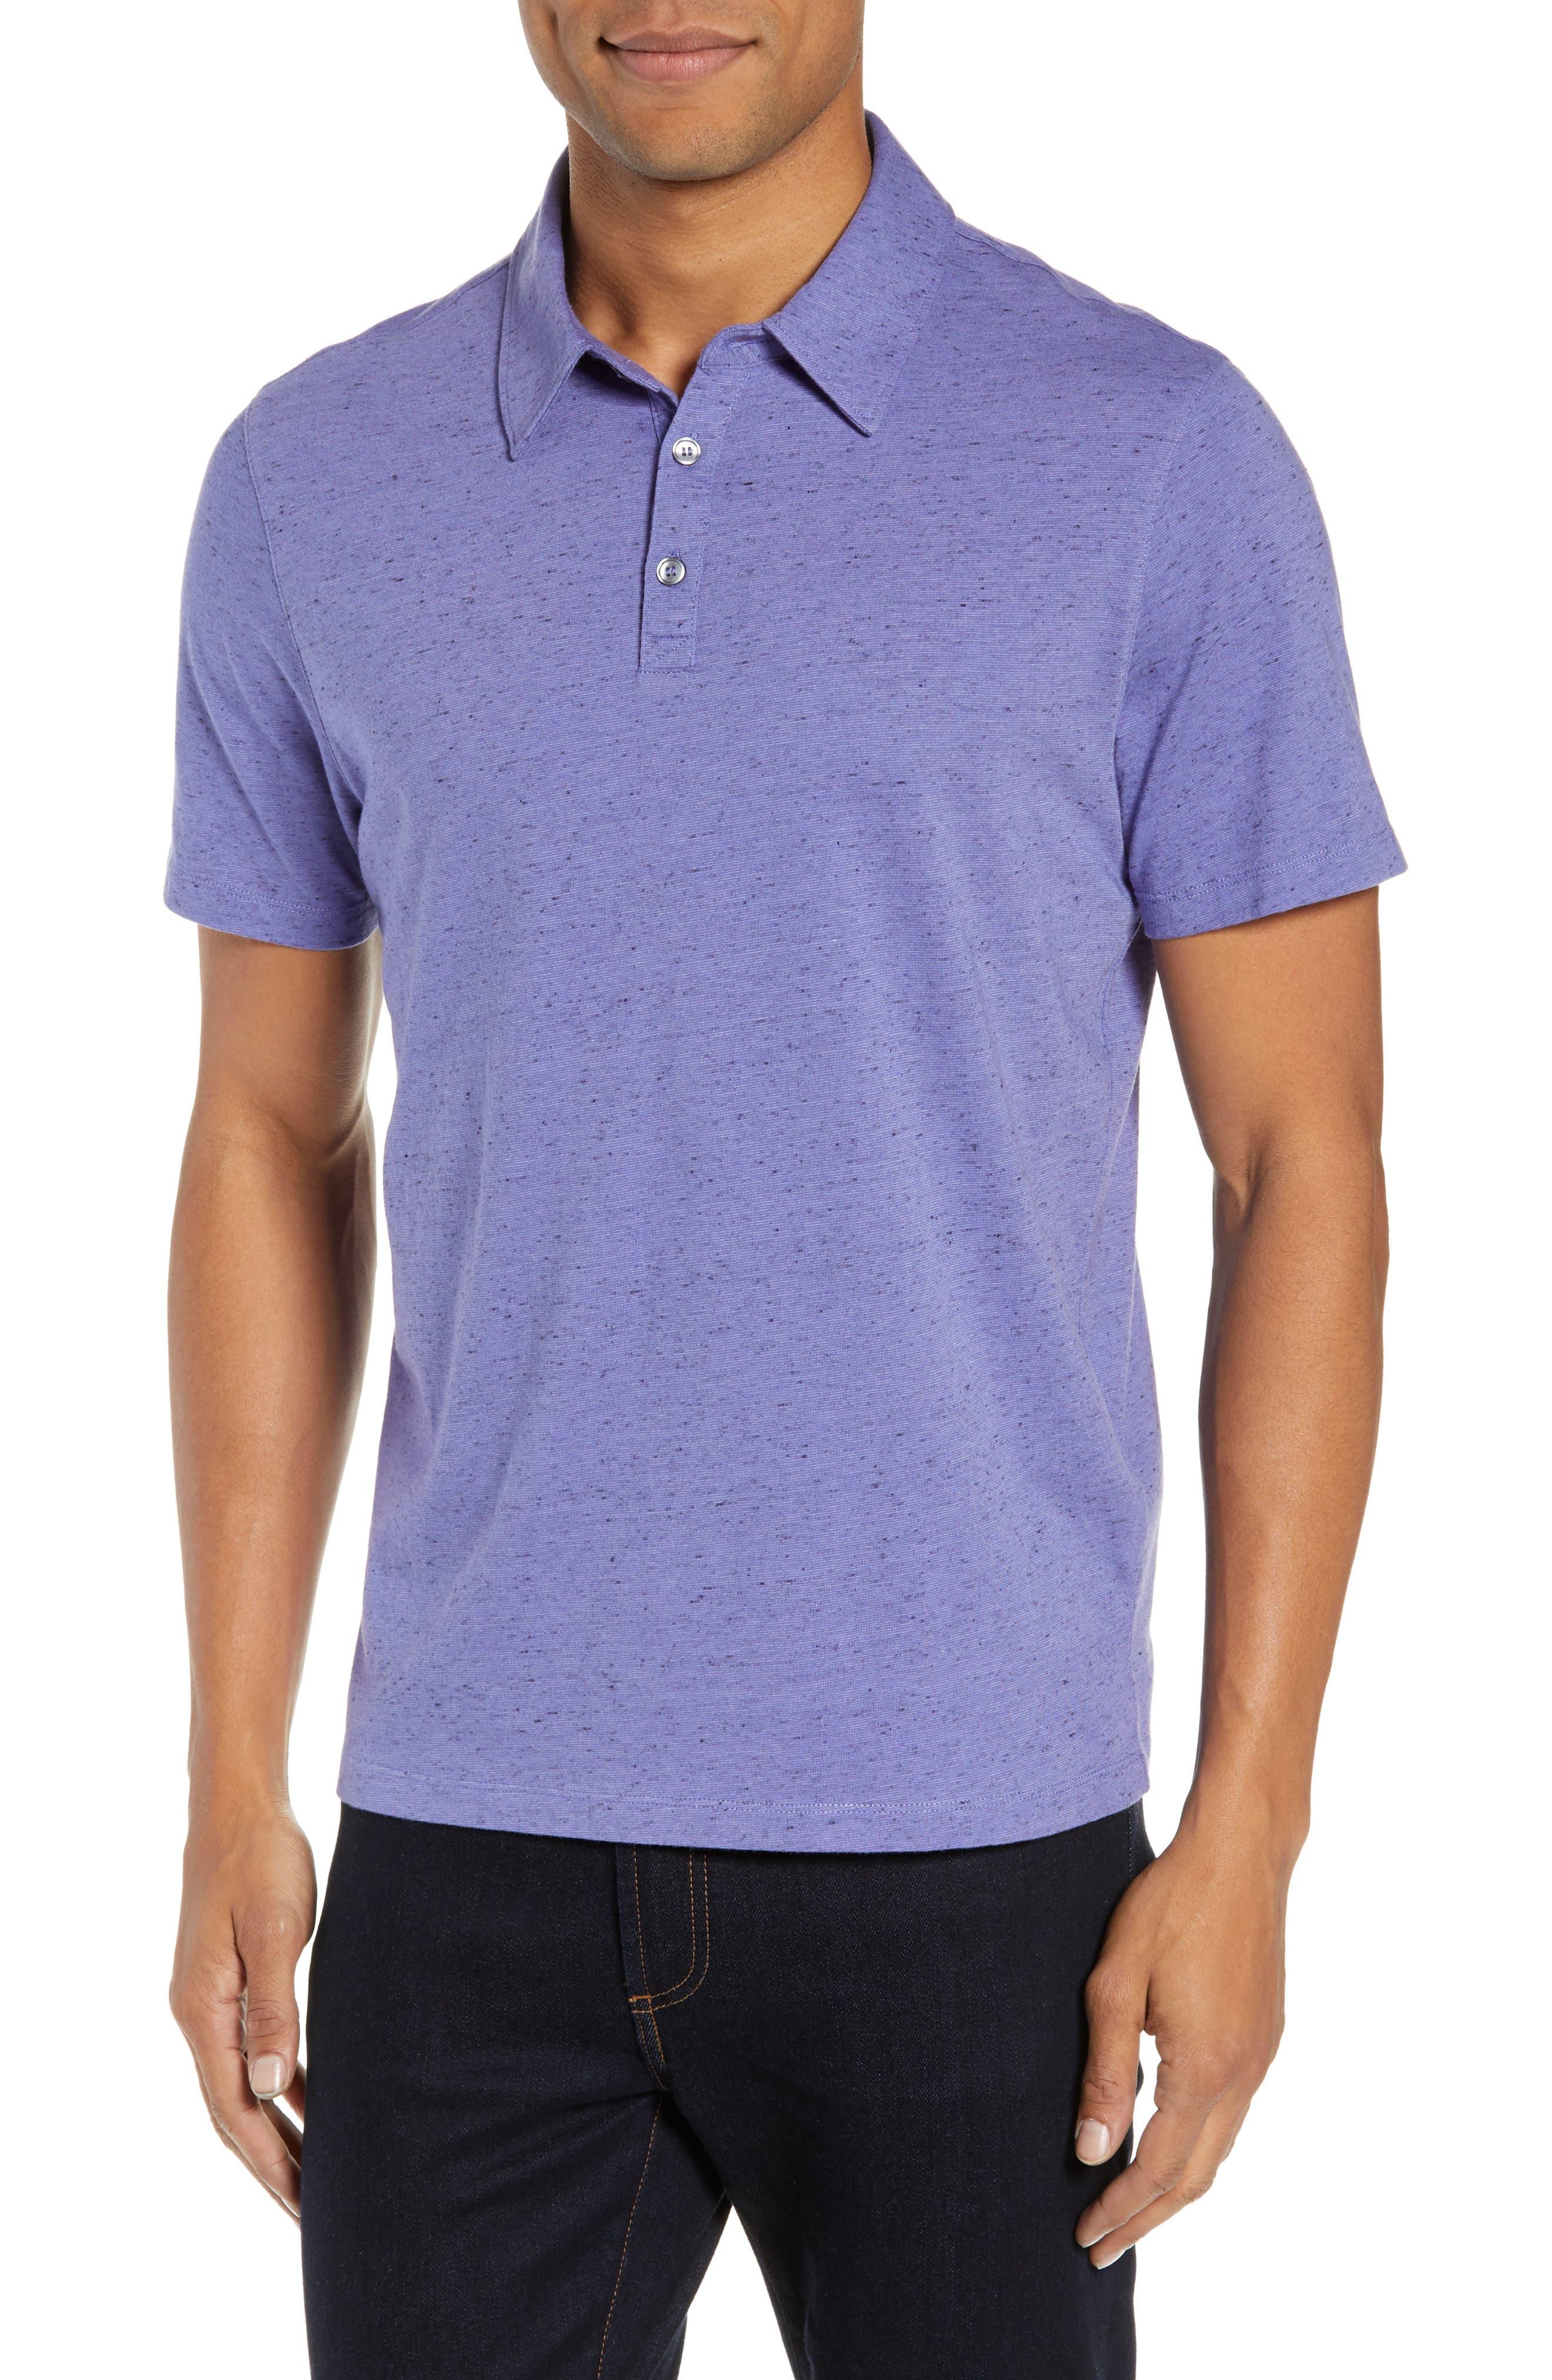 Image of Zachary Prell Cadler Regular Fit Polo Shirt